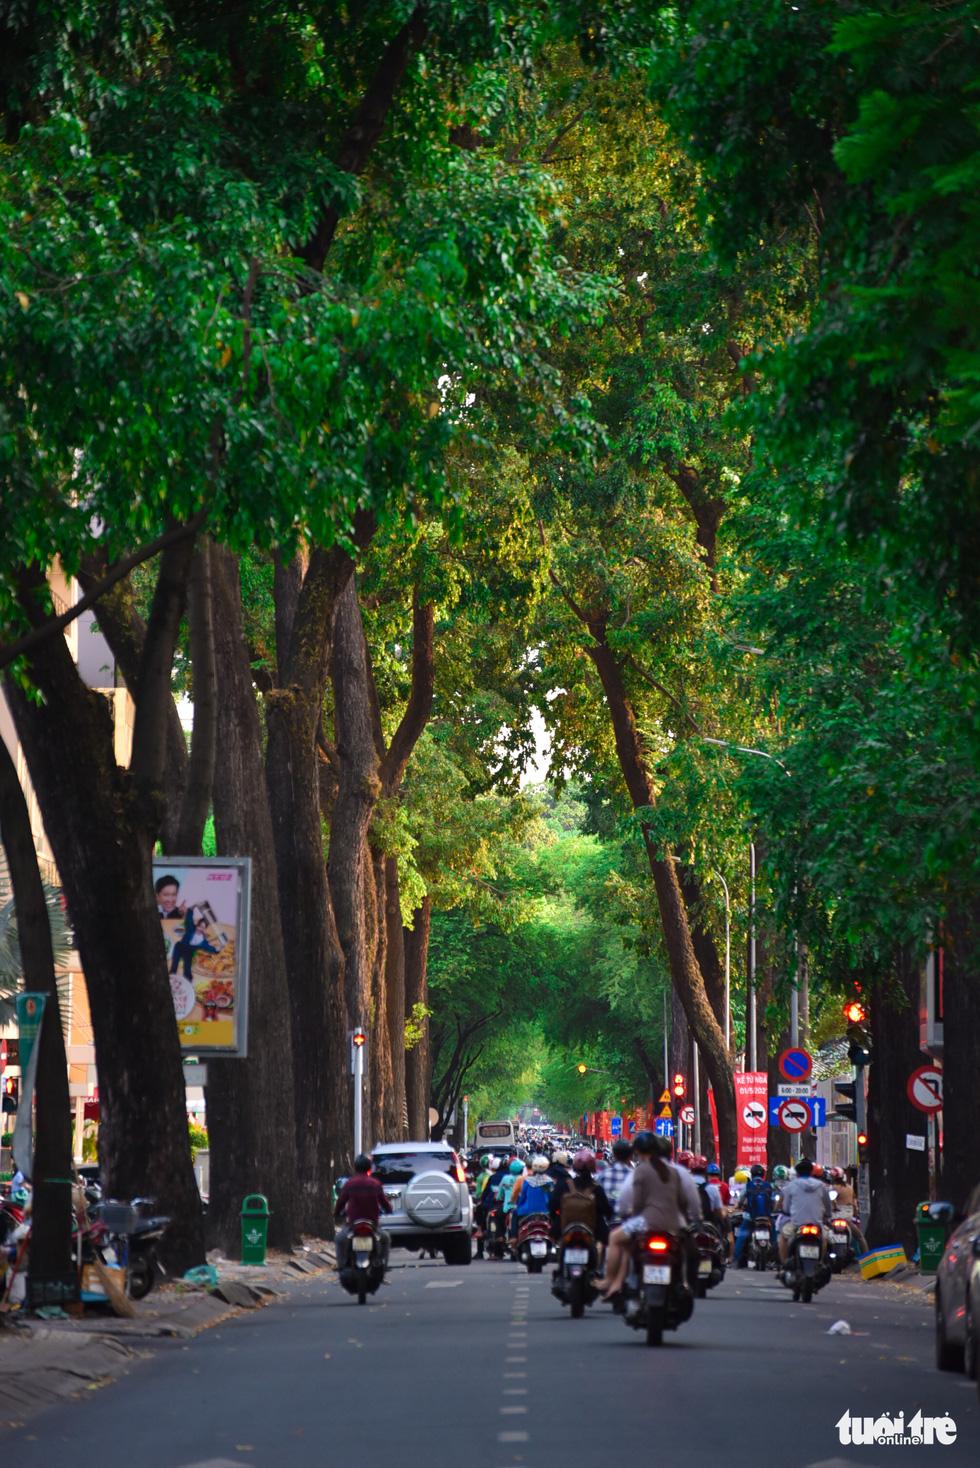 Cho nau trees along Vo Van Tan Street in District 3. Photo: Ngoc Phuong / Tuoi Tre